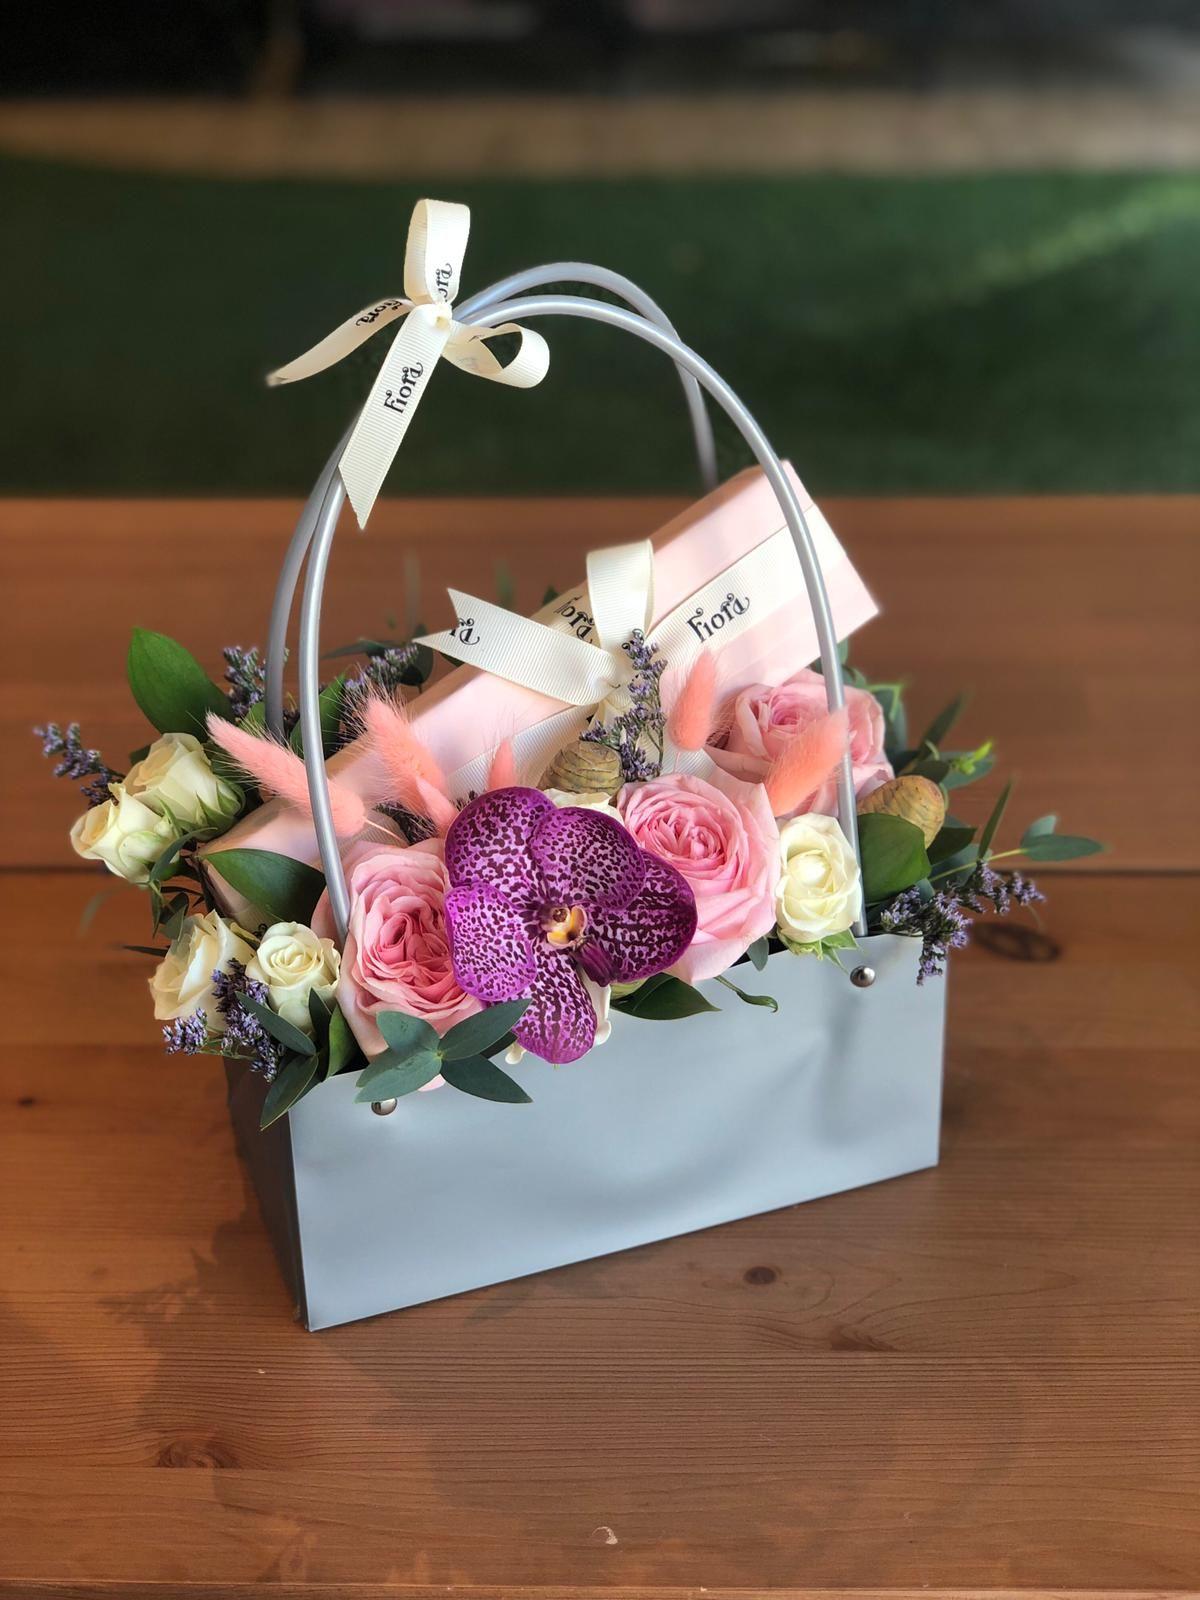 Arrangement Flower Gift Ideas Paper Crafts Diy Kids Flower Gift